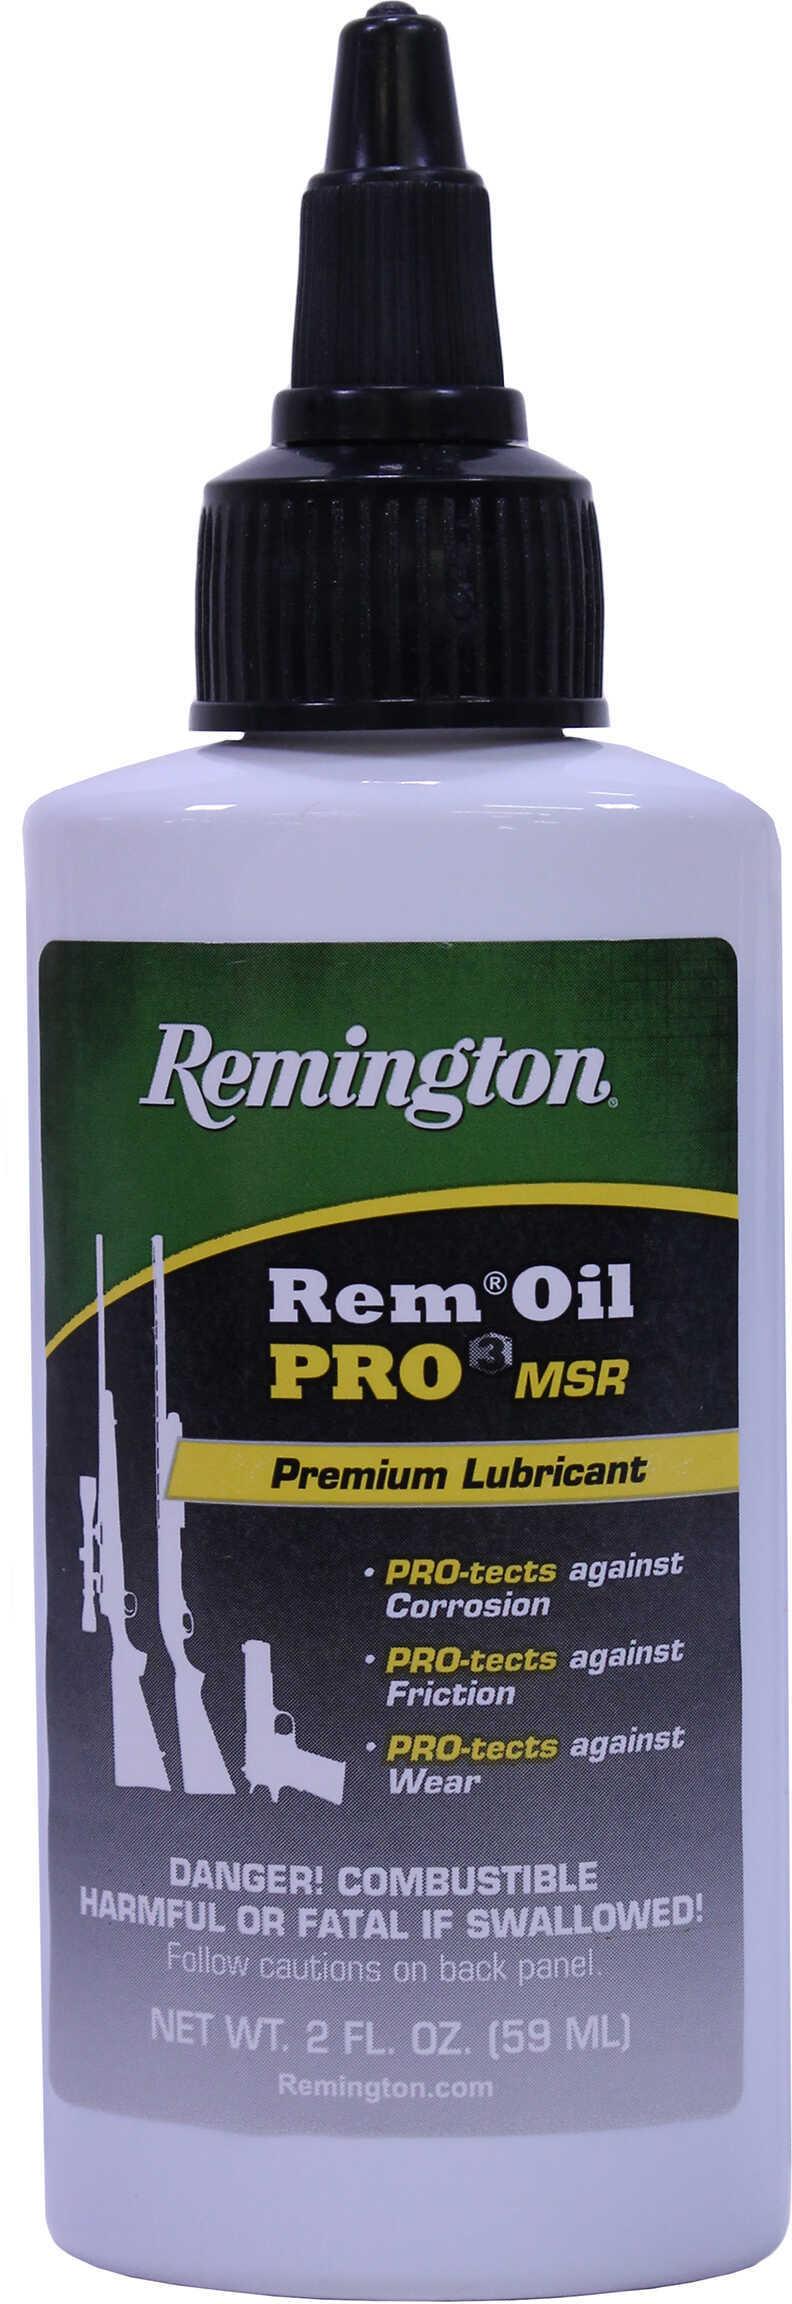 Remington Accessories Pro 3 Oil MSR Premium Lube and Protectant, 2 oz Bottle Md: 18917